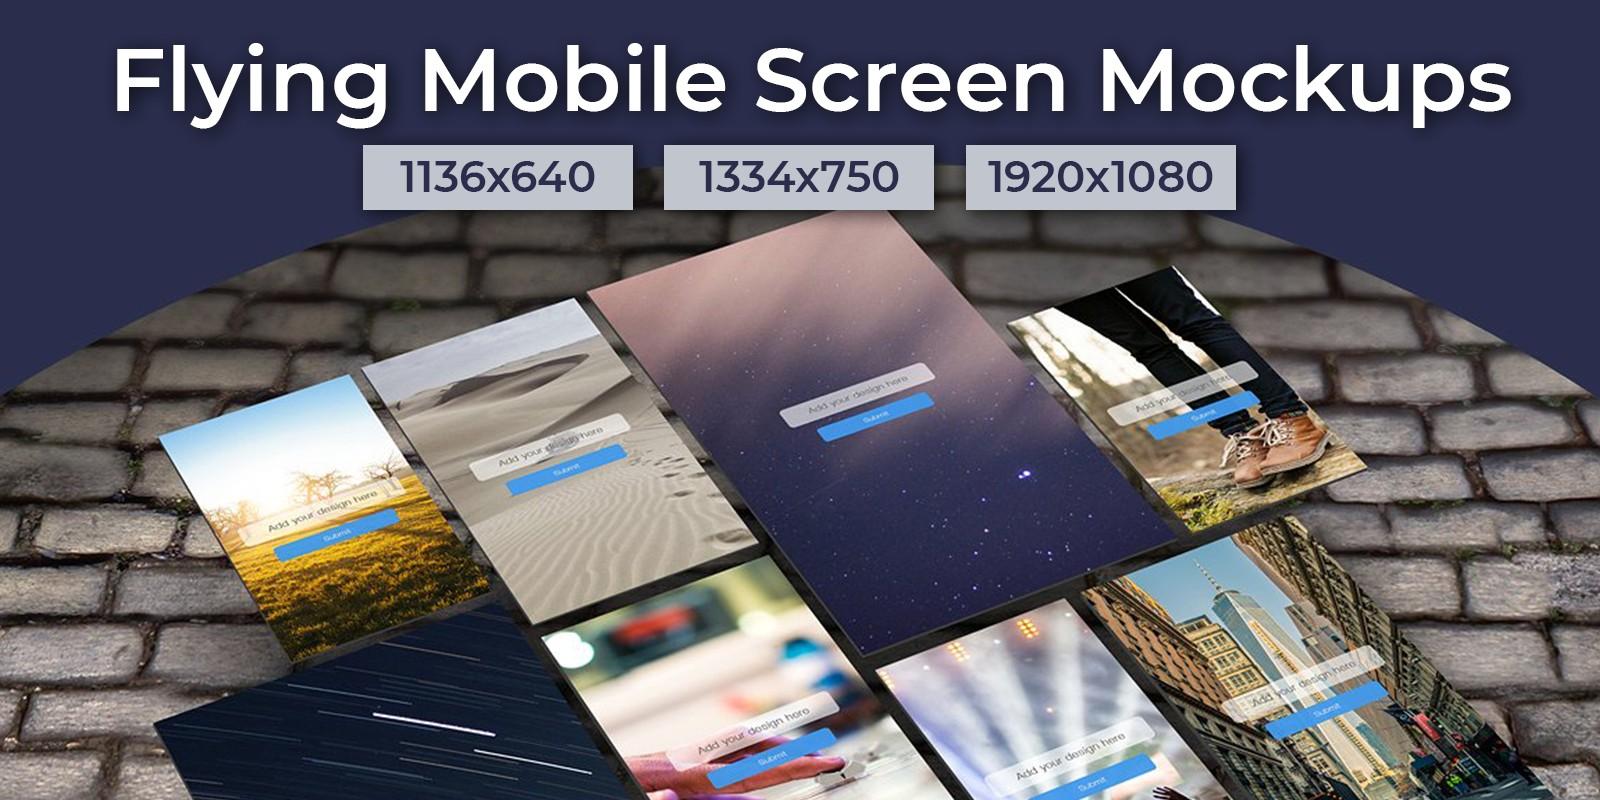 Flying Mobile Screen Mockups